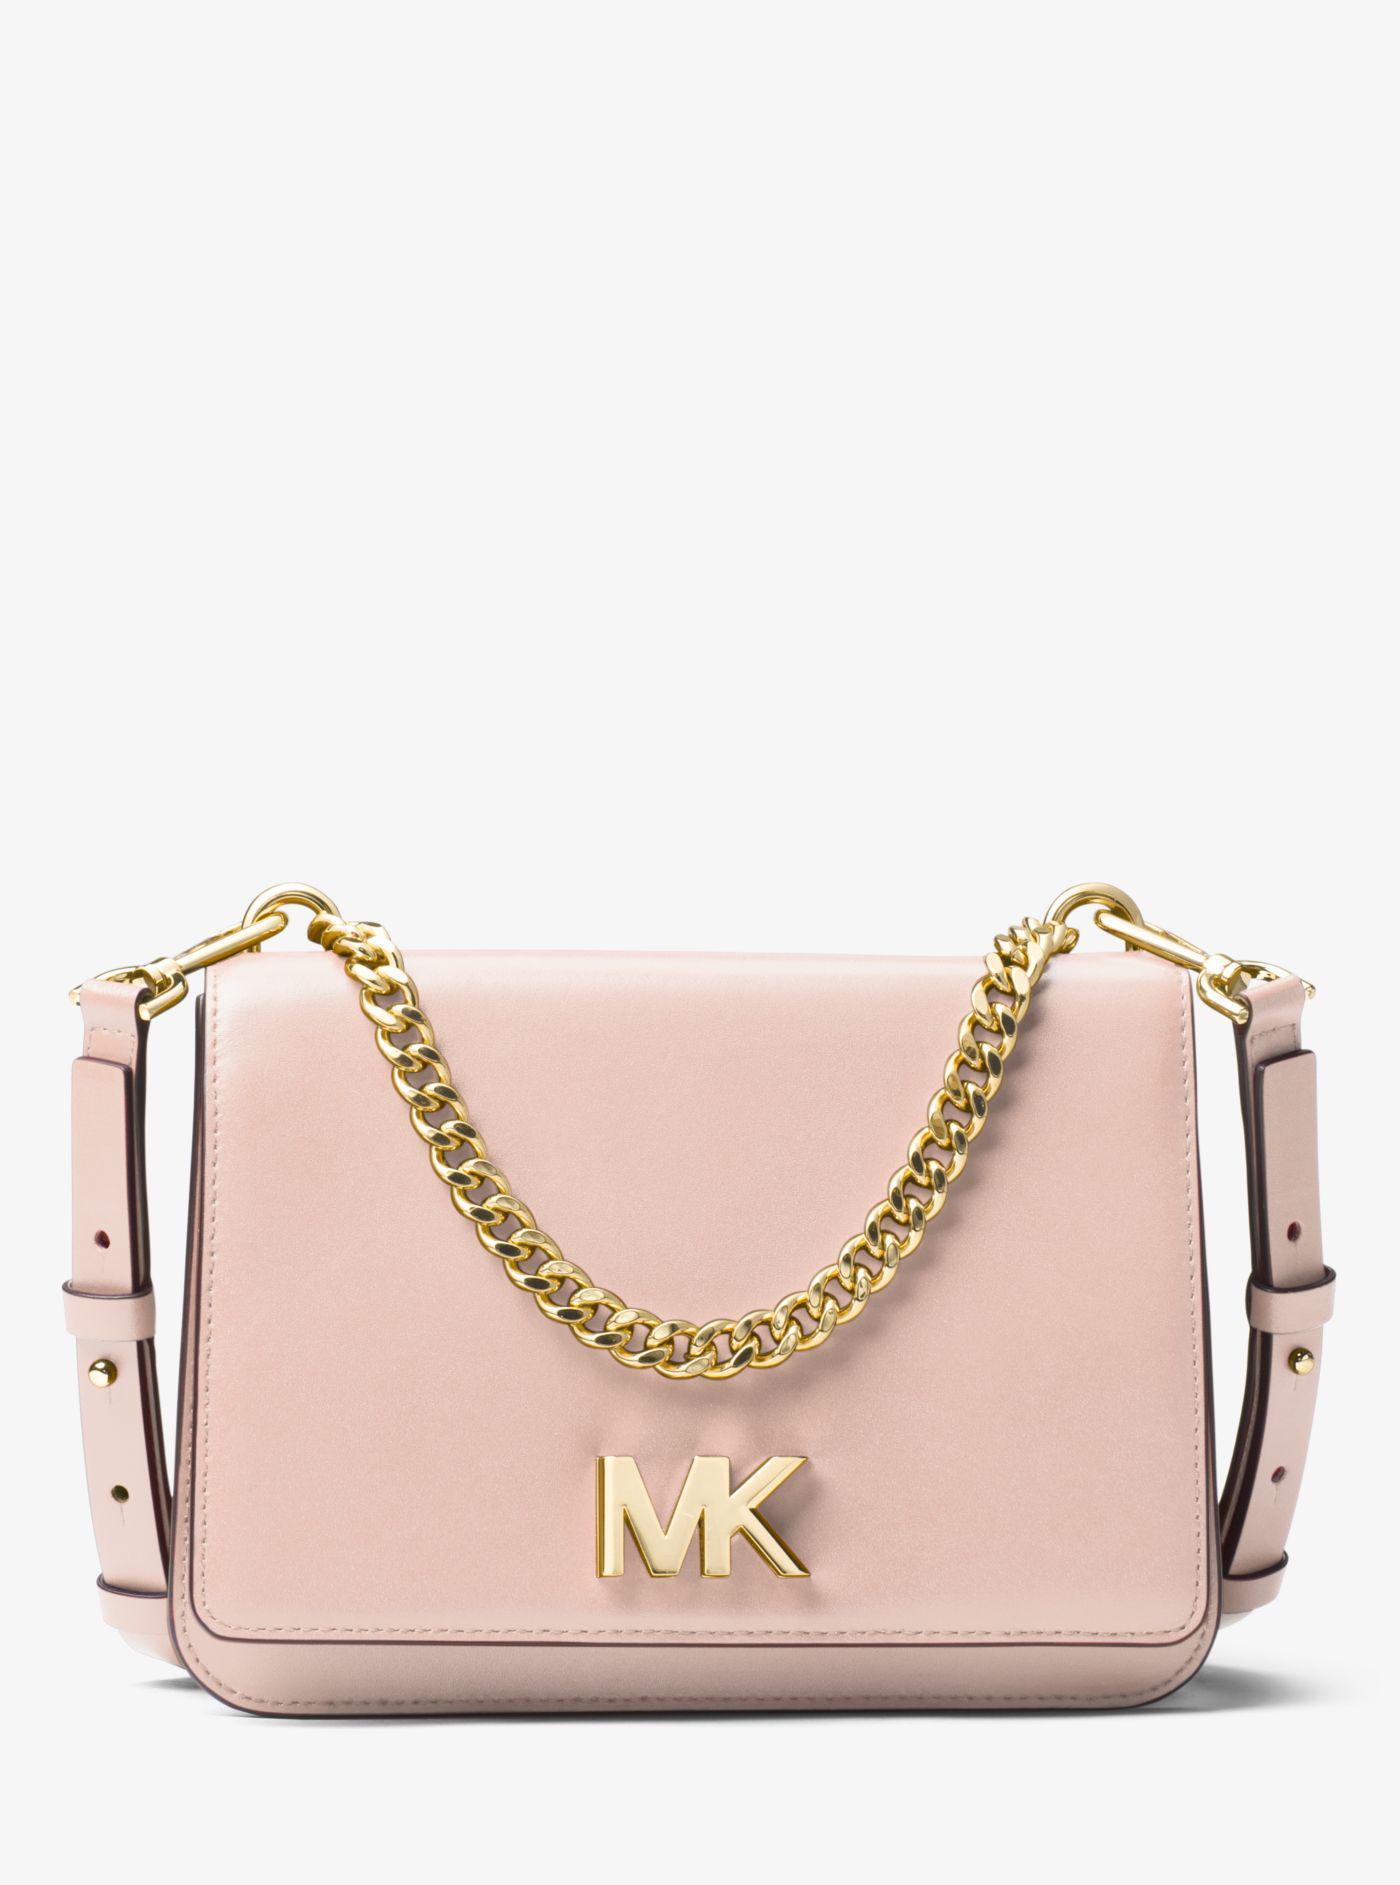 7c9f8a526c3a Lyst - Michael Kors Mott Leather Crossbody Bag in Pink